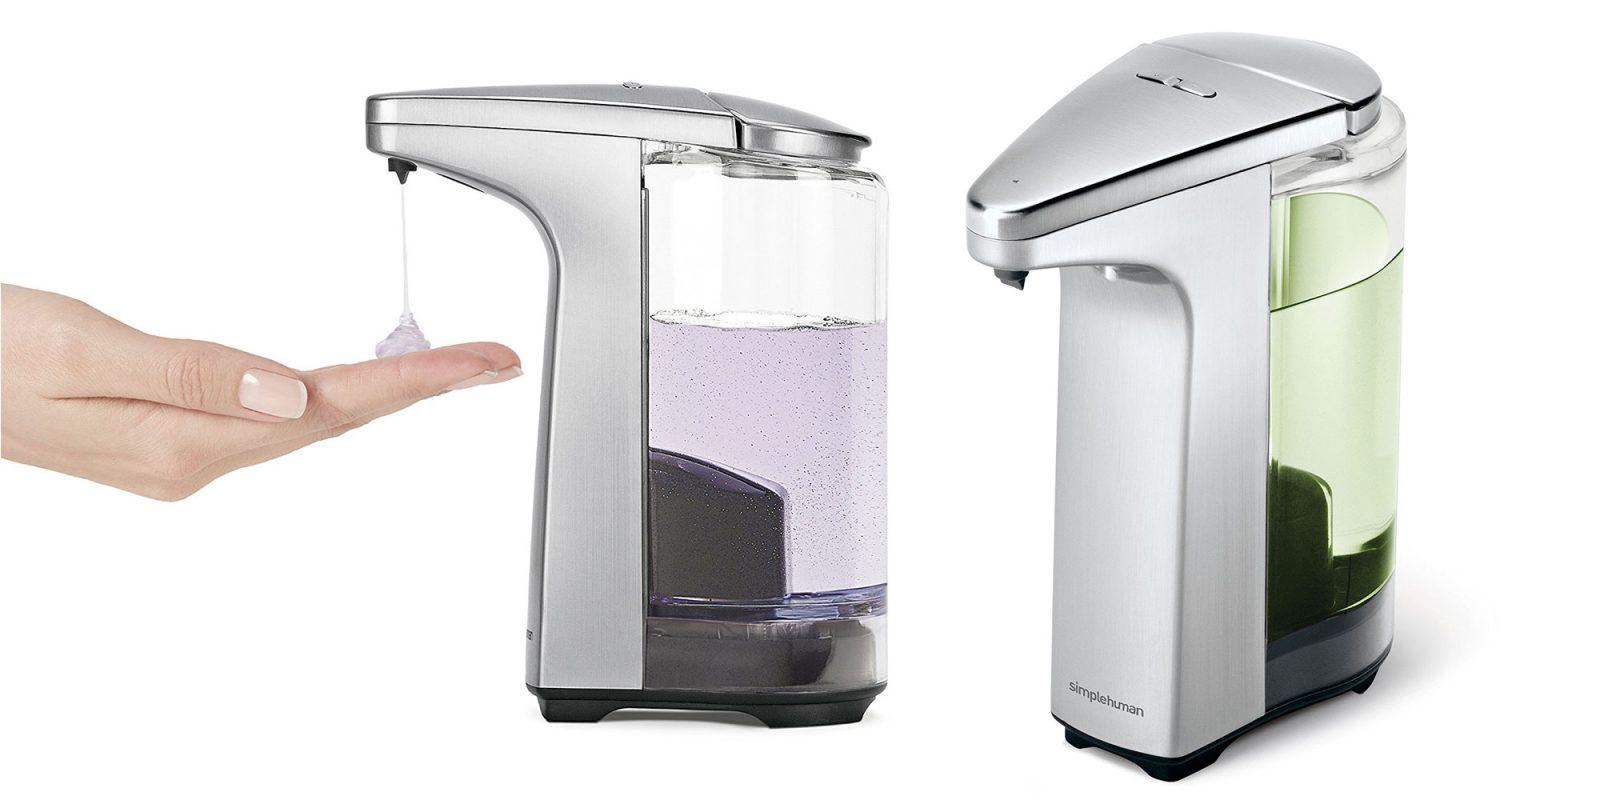 Get Soap Hands Free W This Simplehuman Sensor Based Dispenser At 32 50